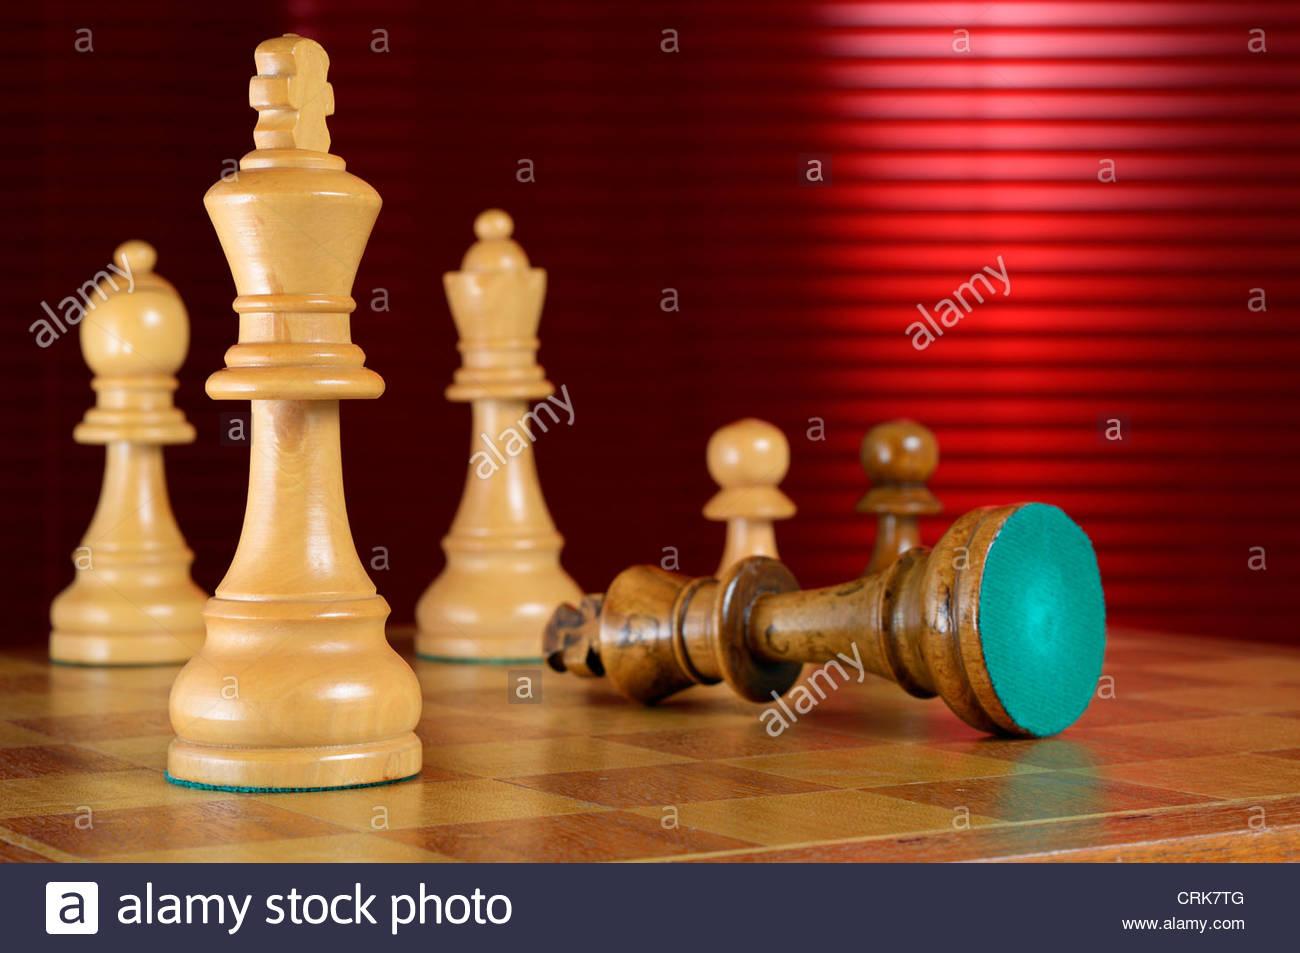 Resignation during chess game, Staunton Chess, Dorset England - Stock Image